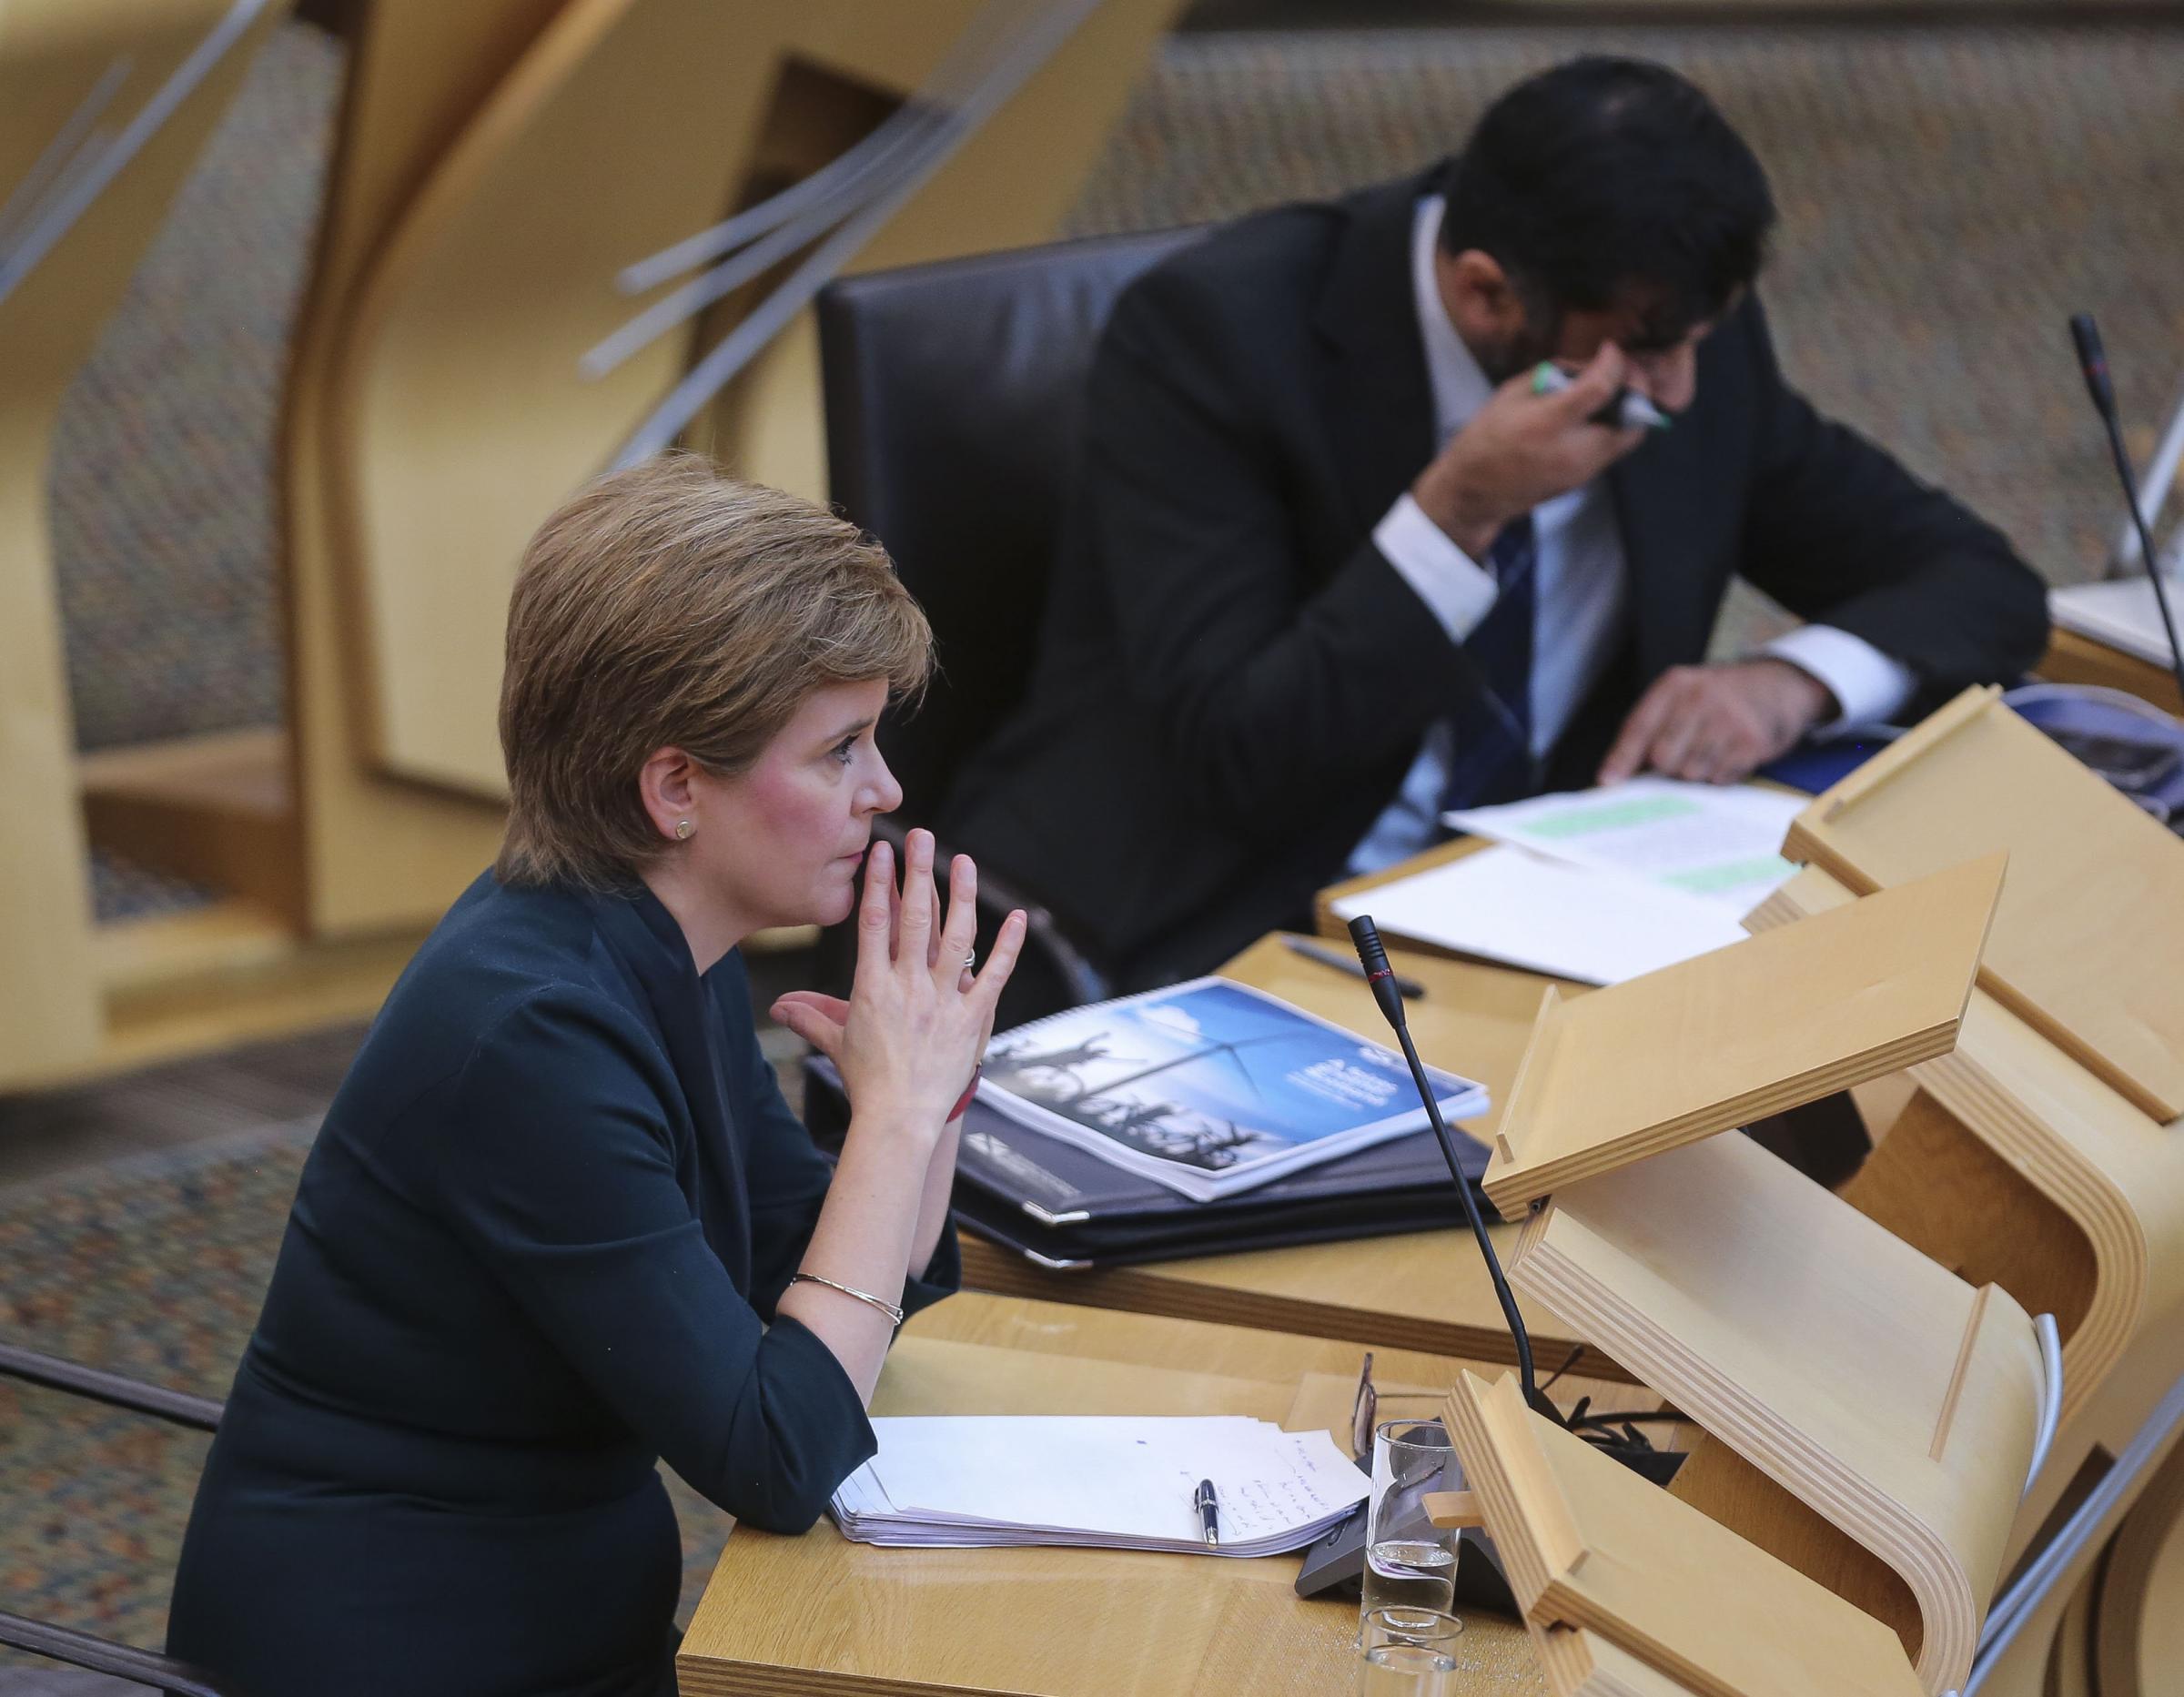 Army to be called in to help Scotland's Ambulance Service, Nicola Sturgeon says